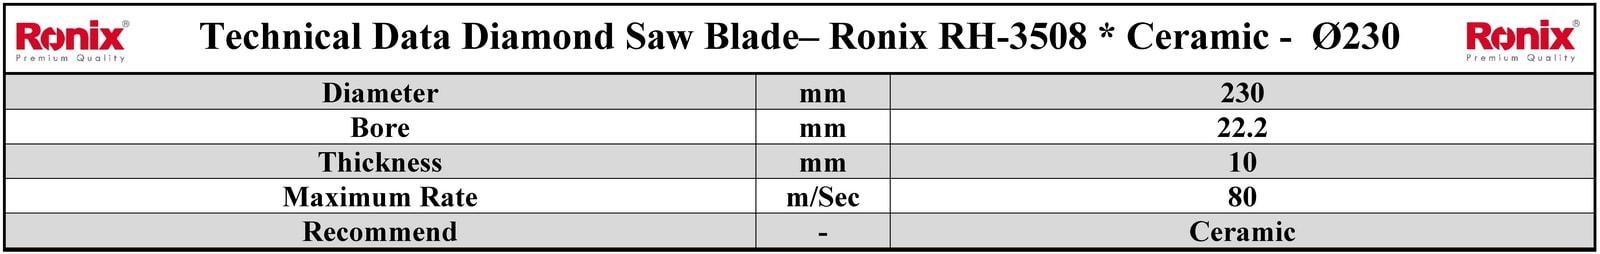 Ronix RH-3508 مشخصات فنی تیغ اره دیسکی الماسه برش سرامیک رونیکس